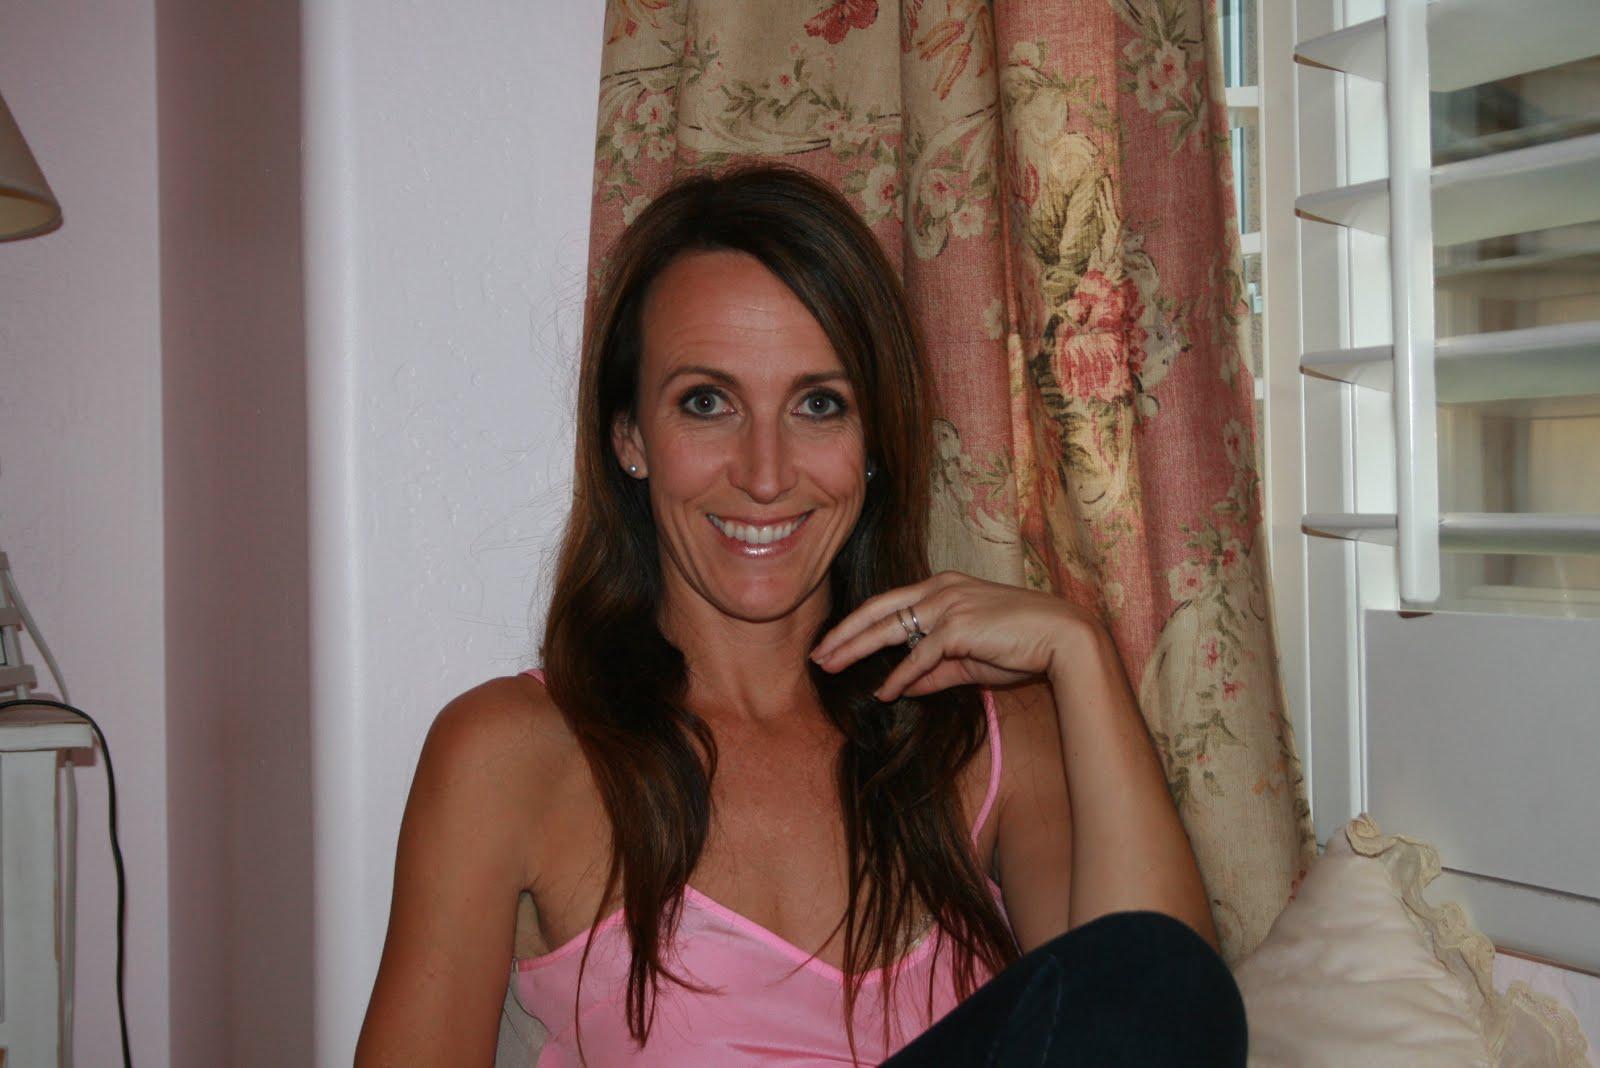 Nicole McGregor